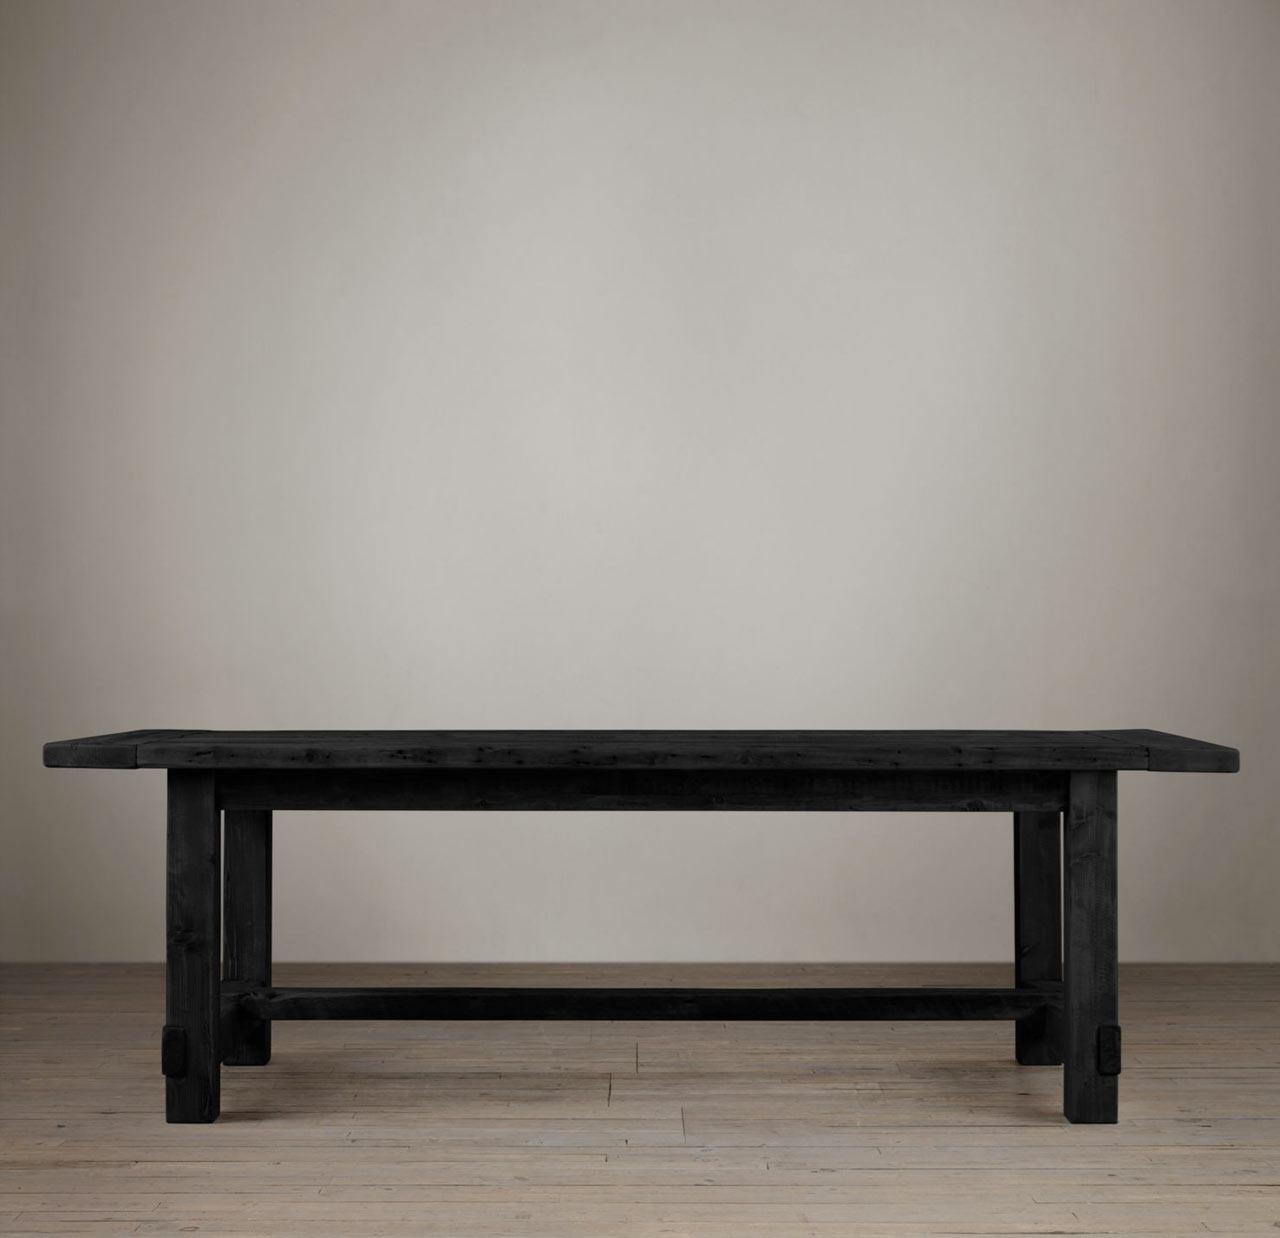 restoration-hardware-farmhouse-salvaged-table-black